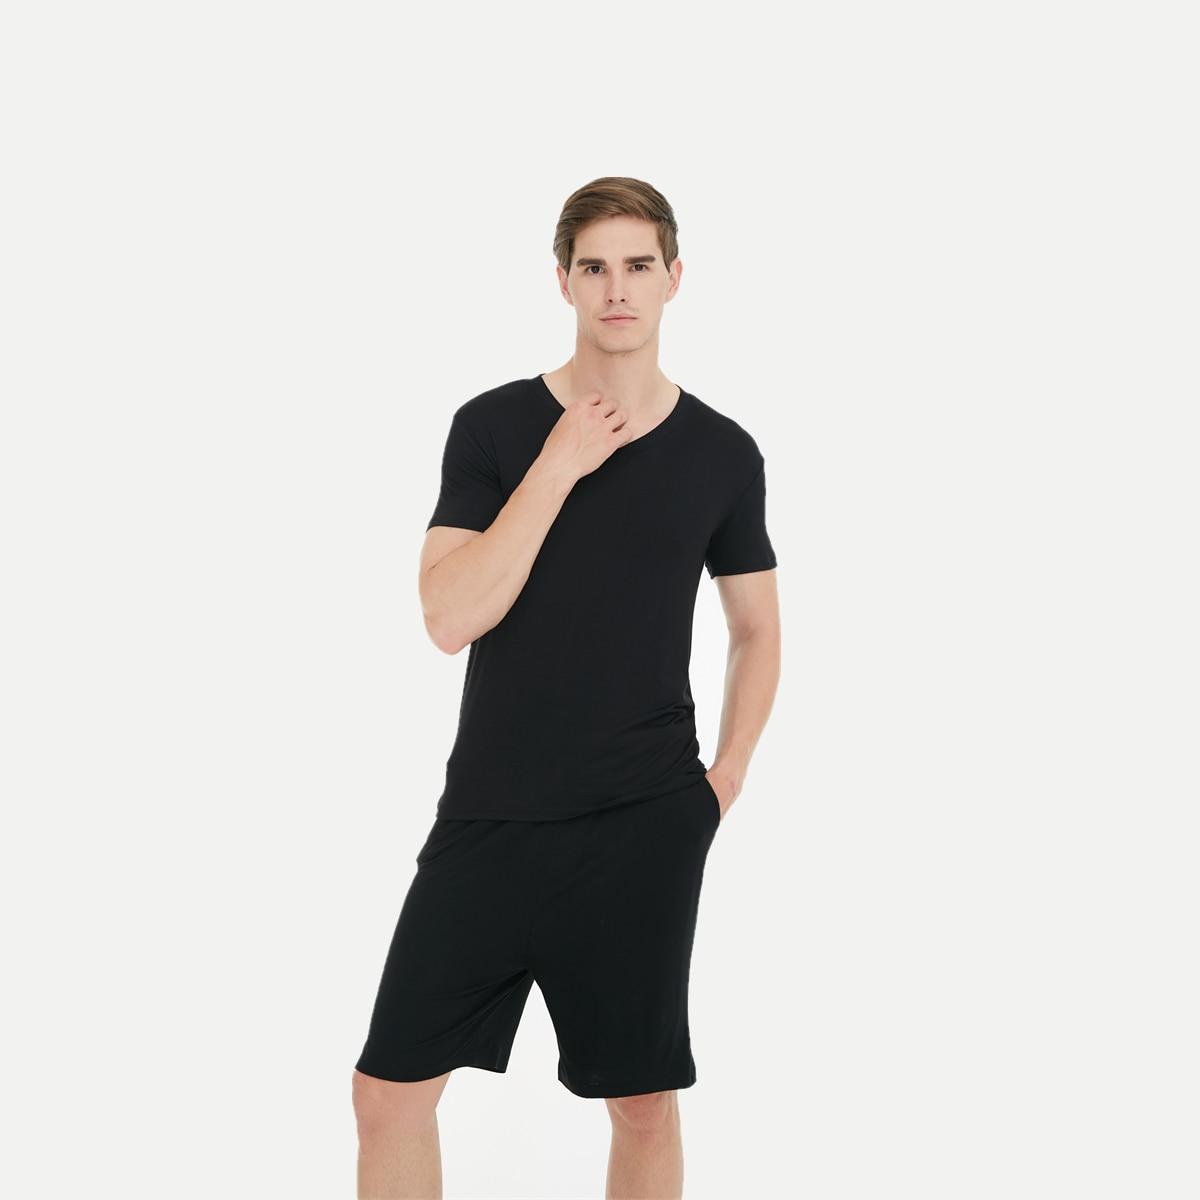 Men's Pajamas Solid-Color Sleepwear Short-Sleeved-Shorts Home-Set Summer Casual V-Neck